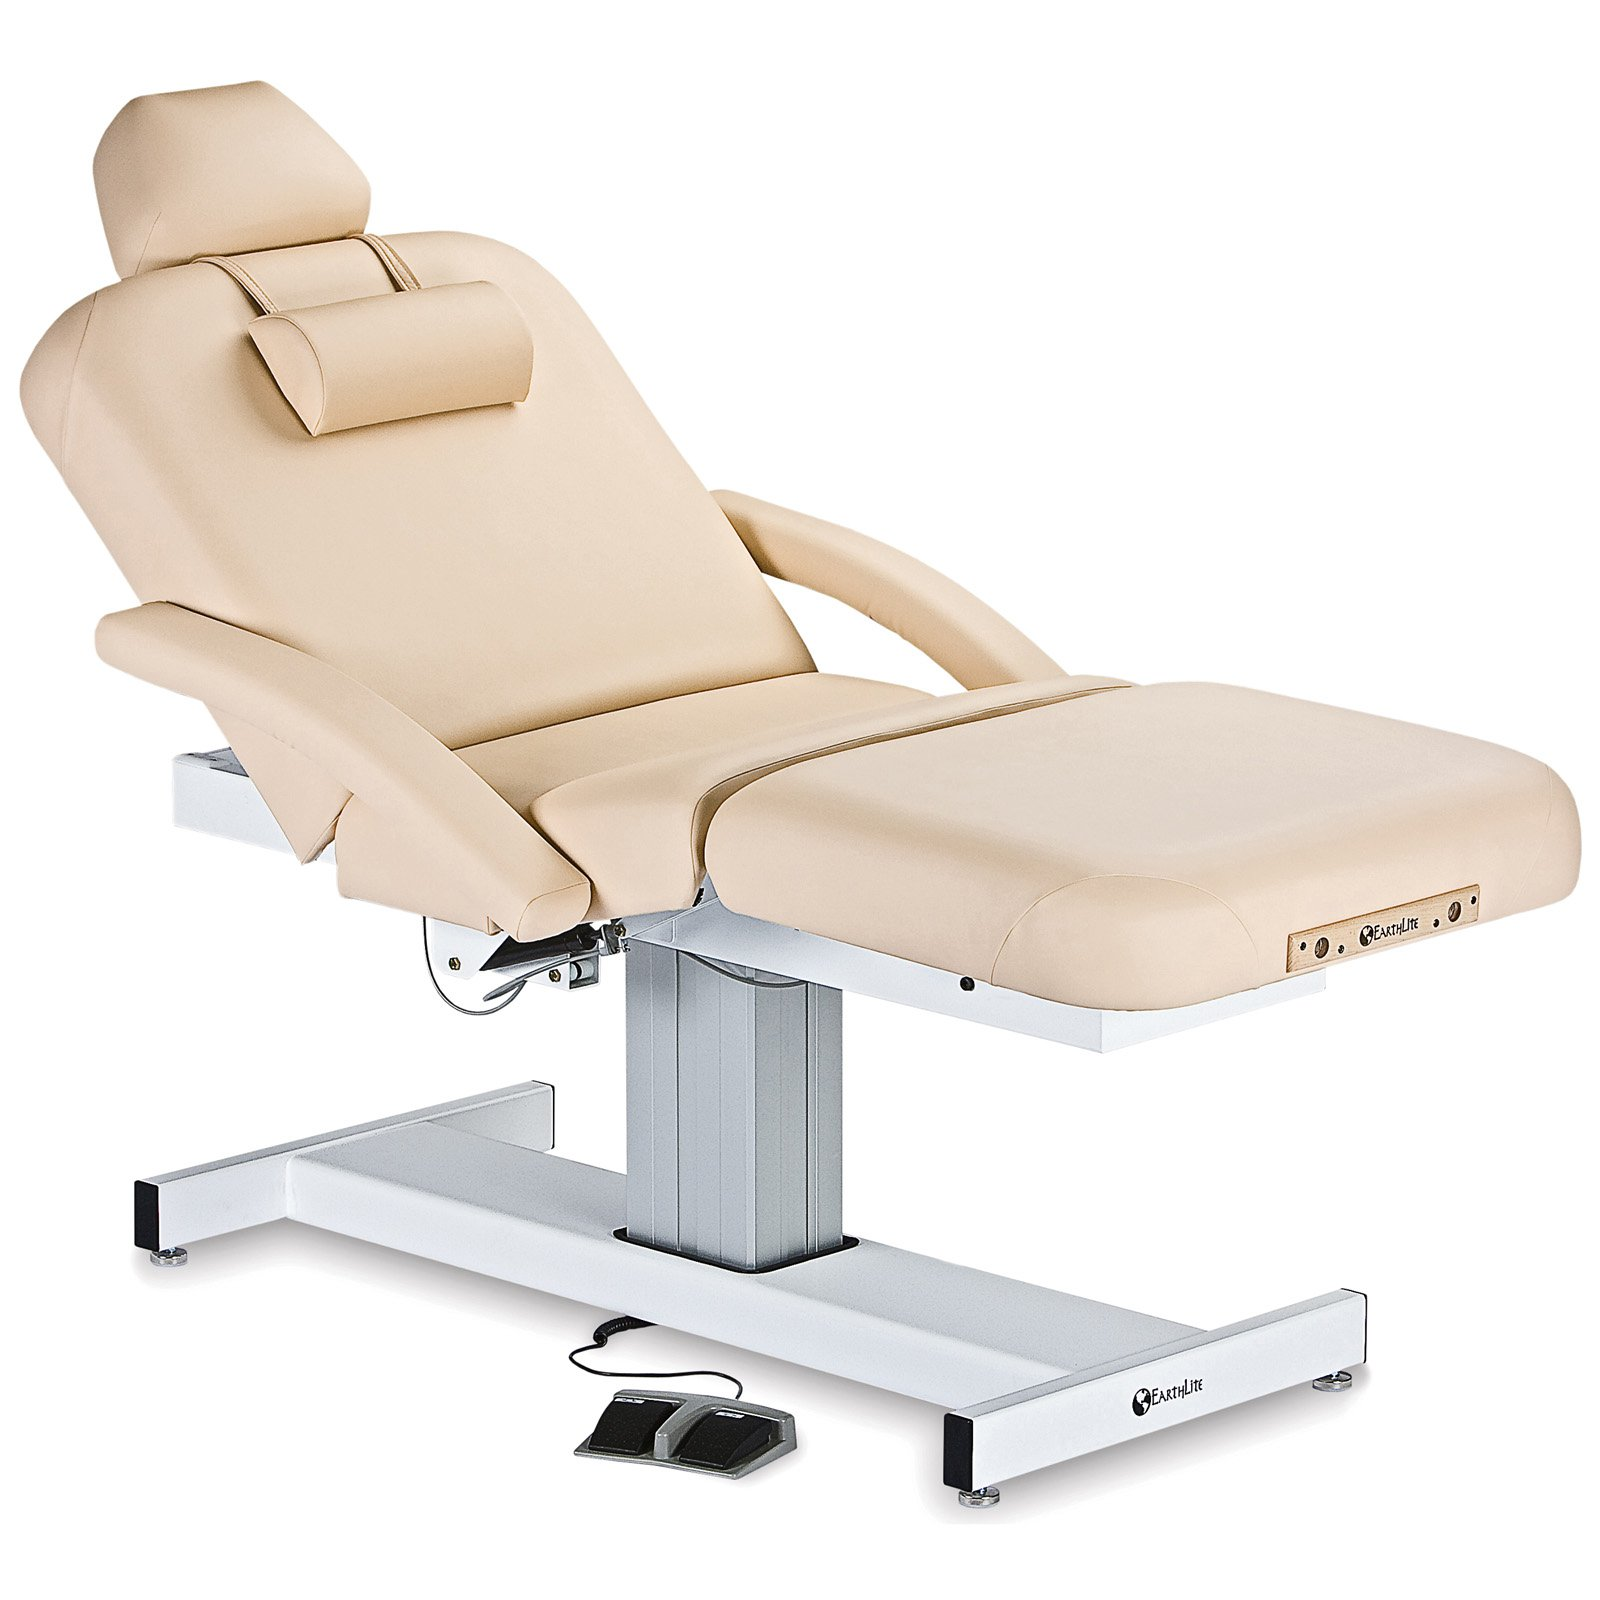 EarthLite Everest Salon Stationary Lift Massage Table